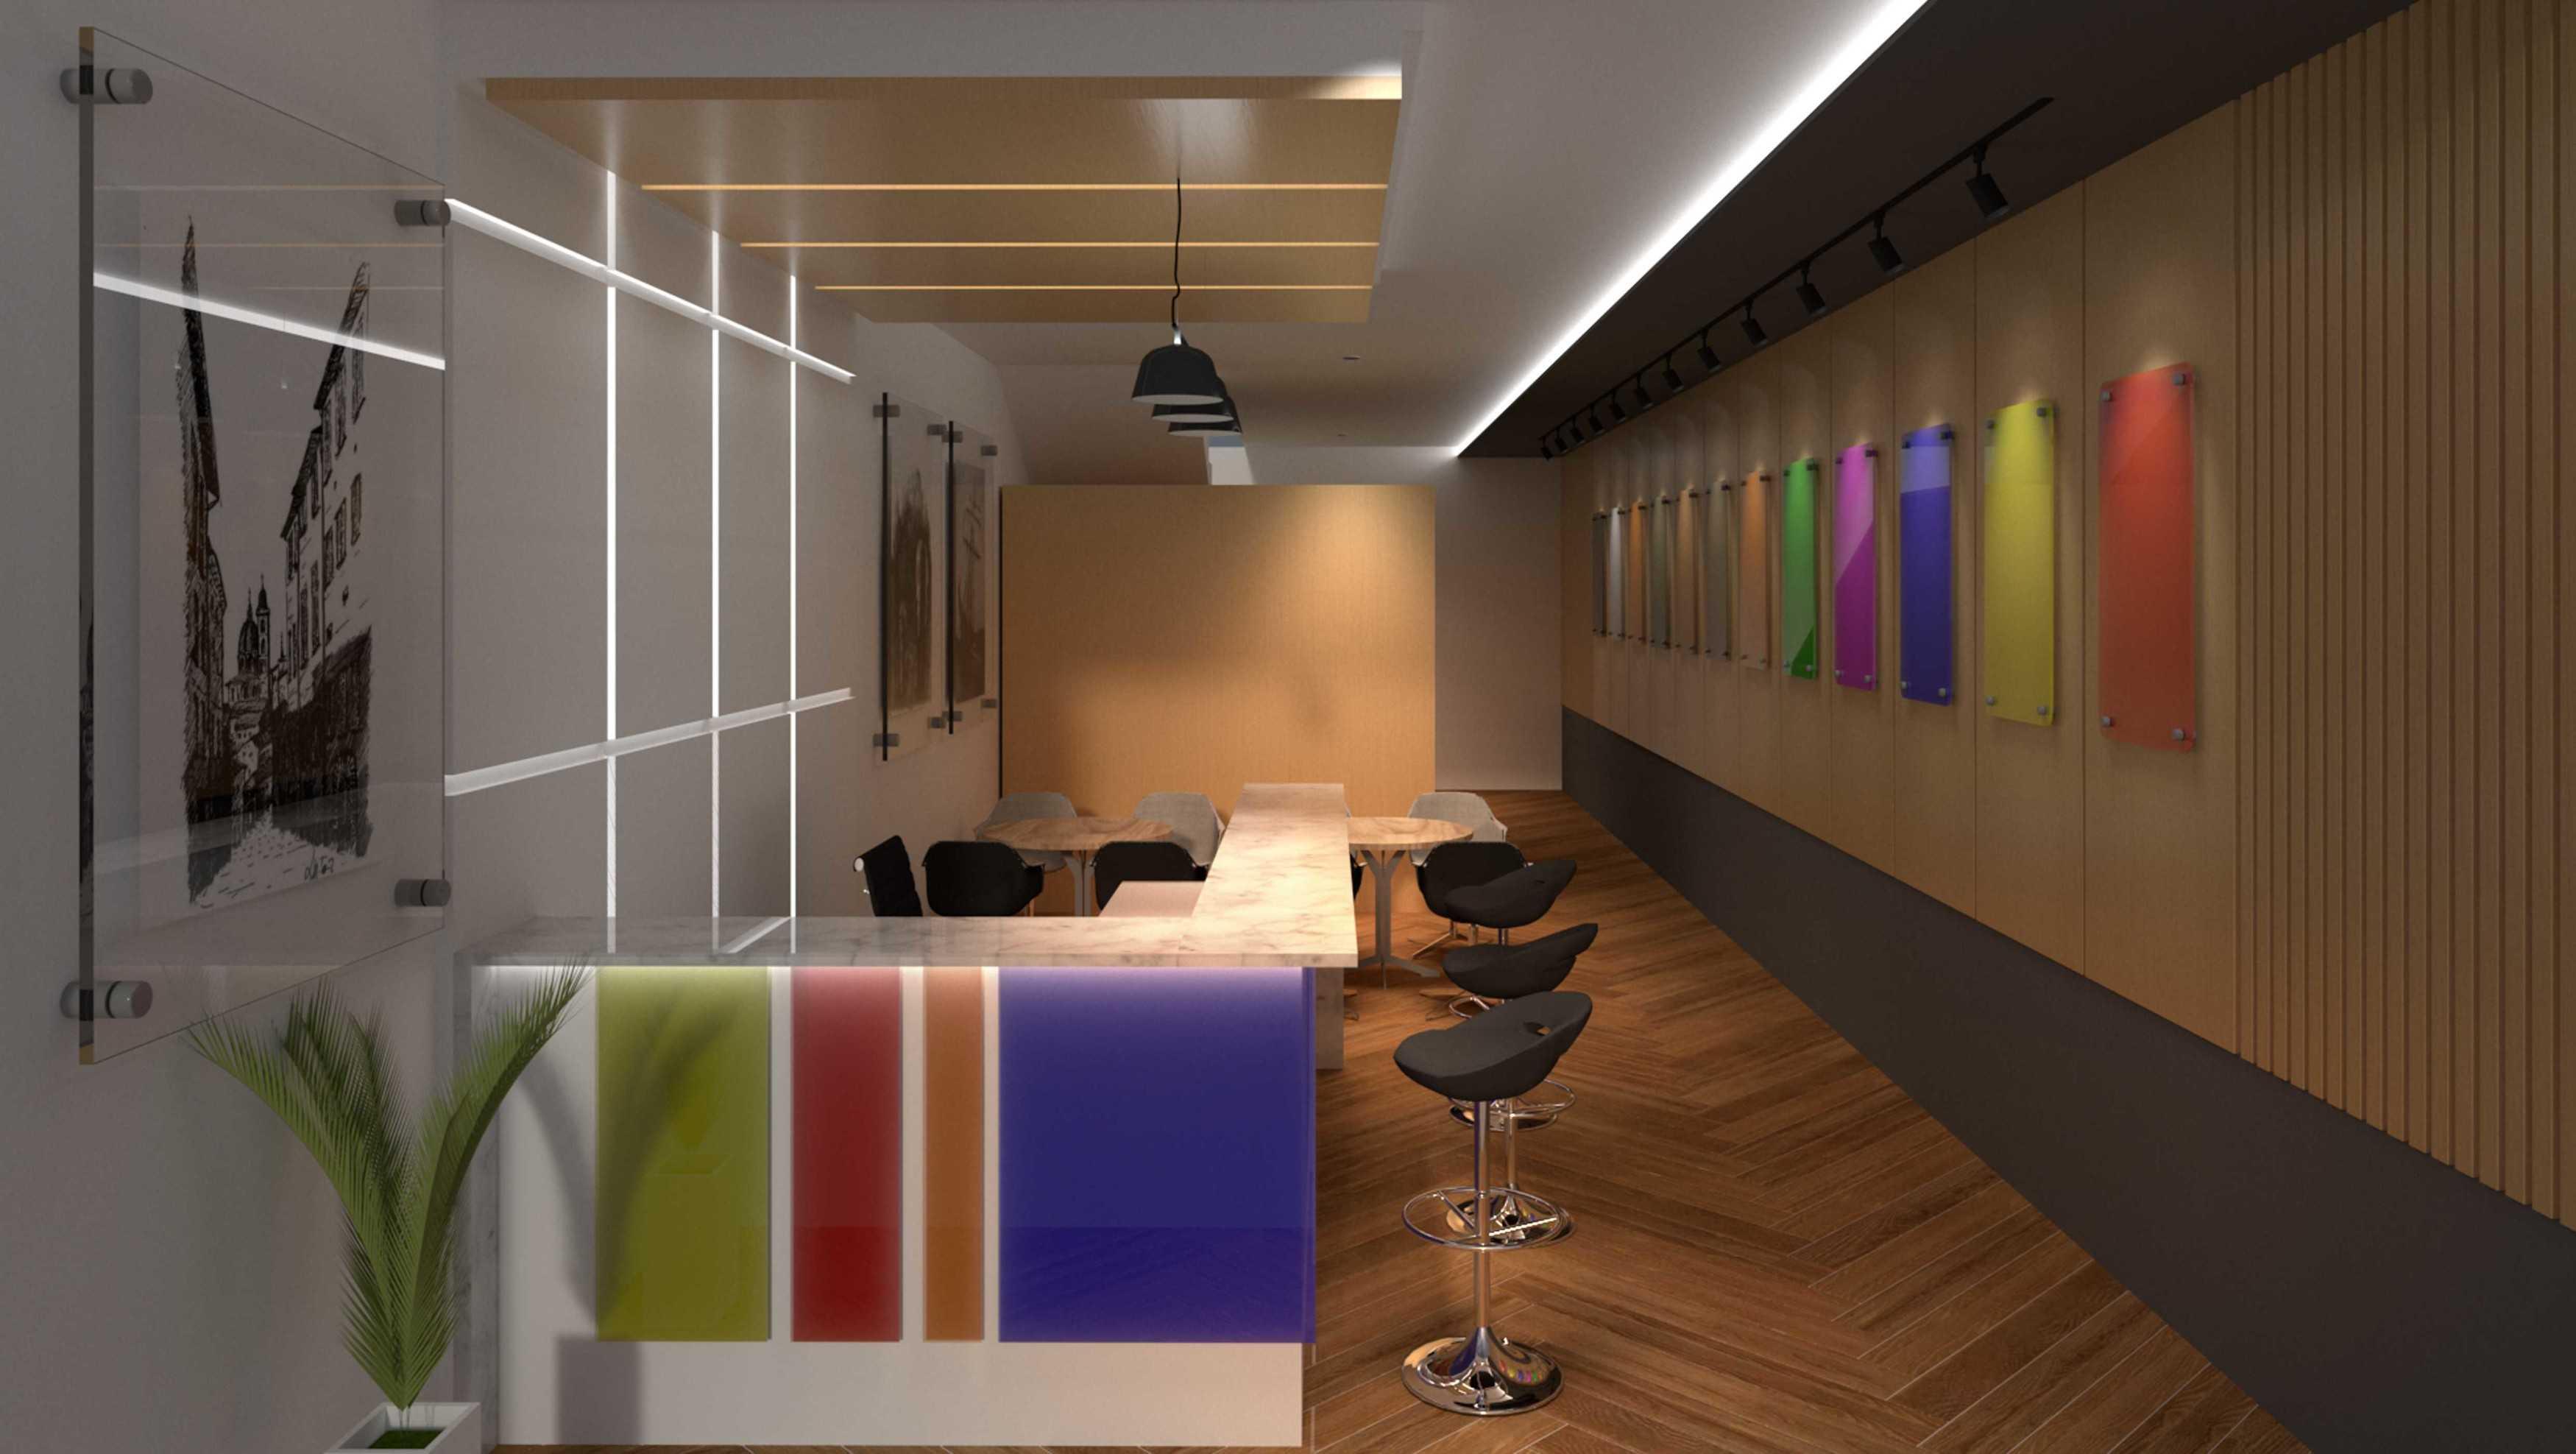 Yrs Design Interior Acrylic Store Kota Tgr. Sel., Kota Tangerang Selatan, Banten, Indonesia Kota Tgr. Sel., Kota Tangerang Selatan, Banten, Indonesia Yrs-Design-Interior-Acrylic-Store   112763